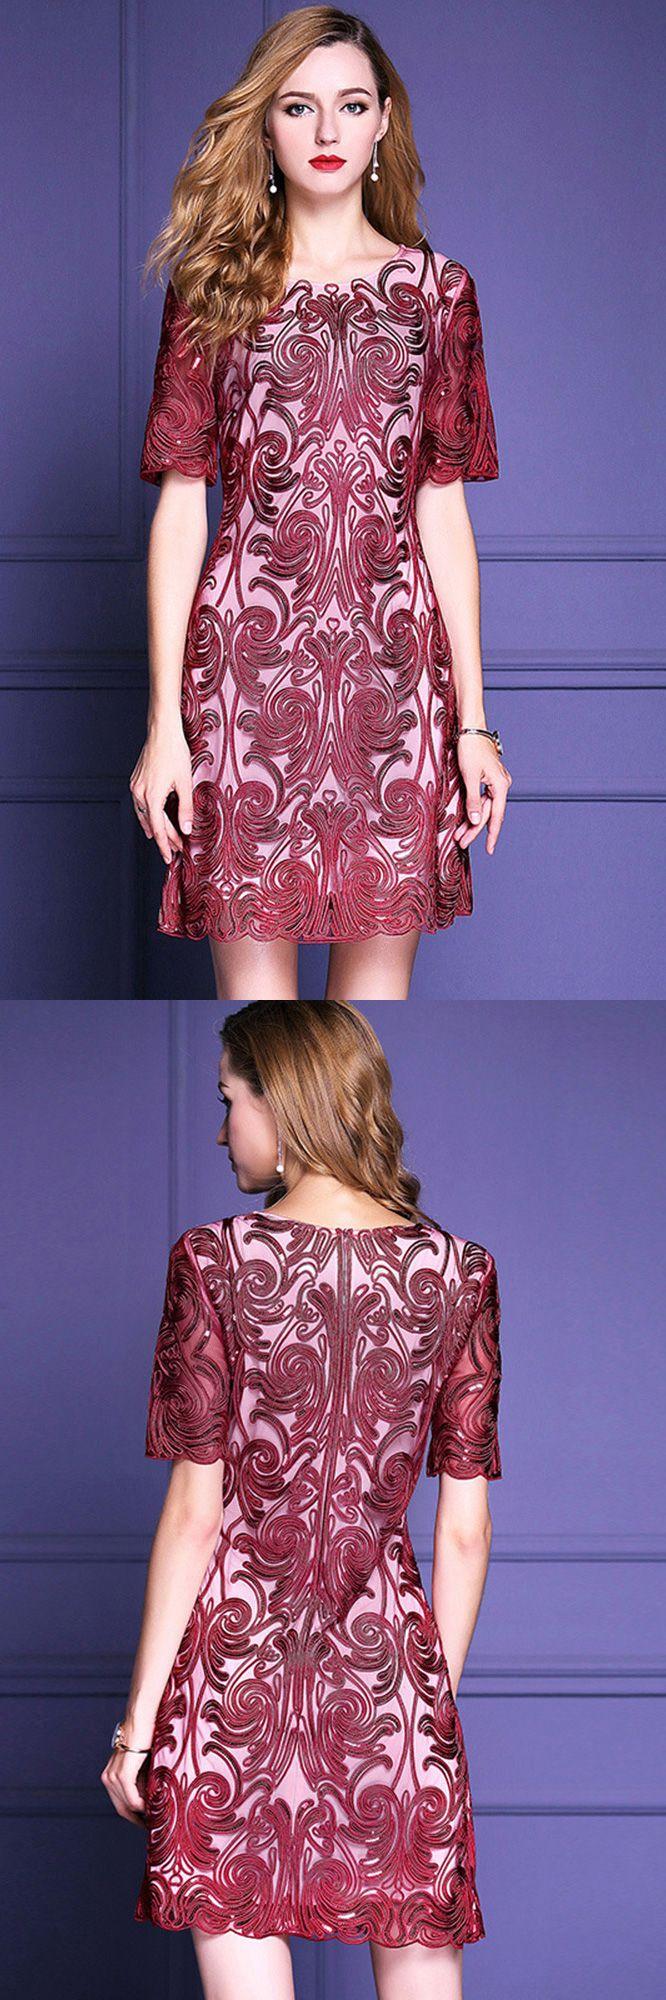 1452 best Vestidos images on Pinterest | Block dress, Asian fashion ...